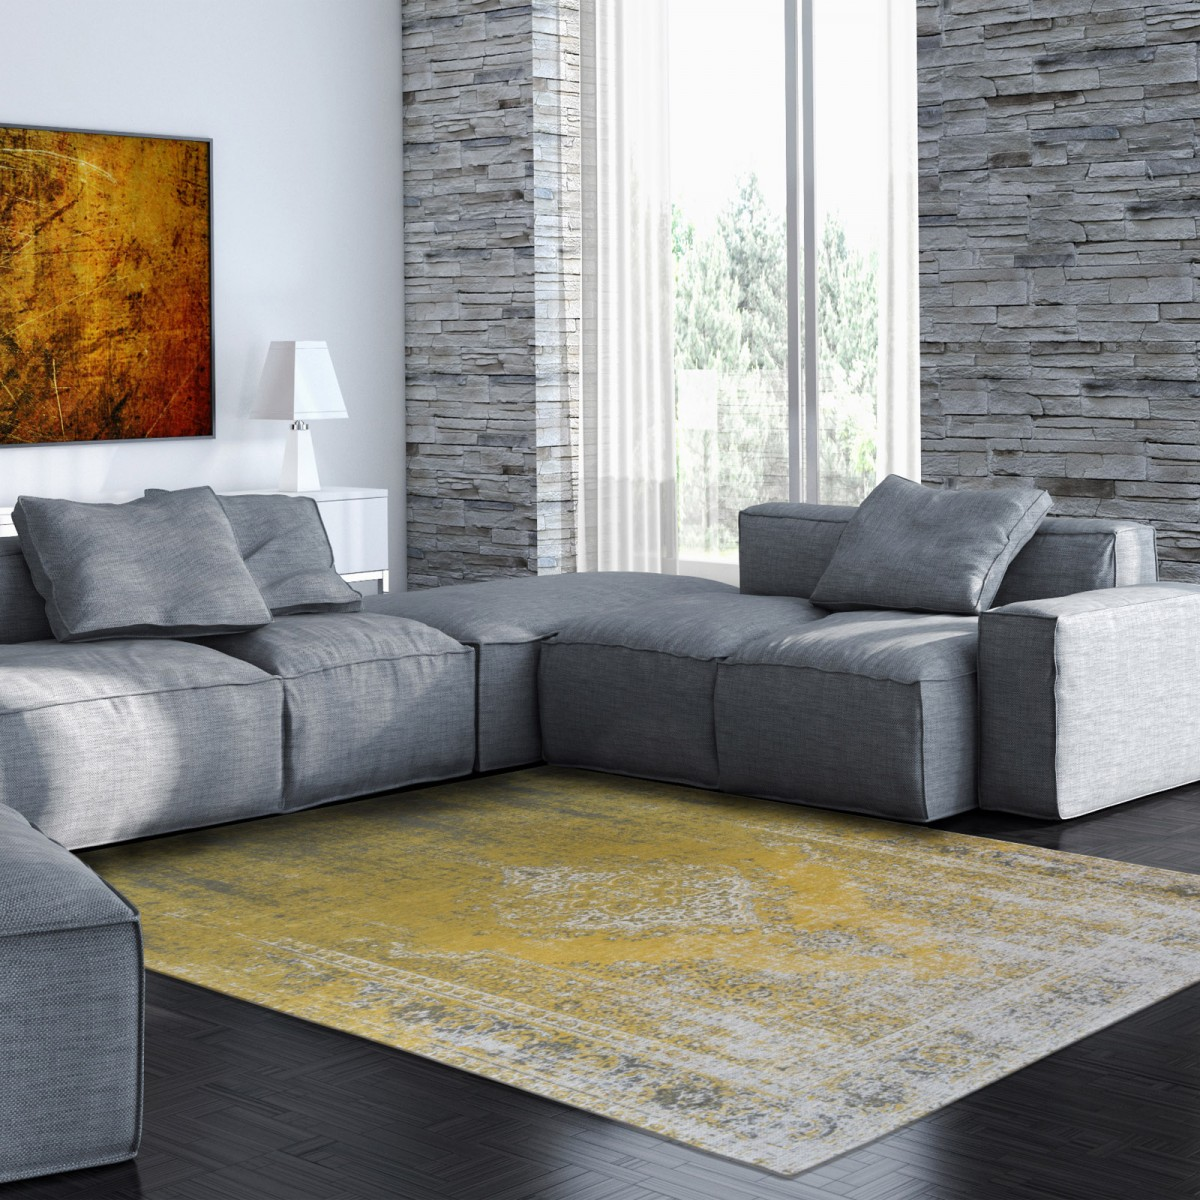 Yuzu Cream 8638 | Louis de Poortere Generation Collection Rugs | Best at Flooring